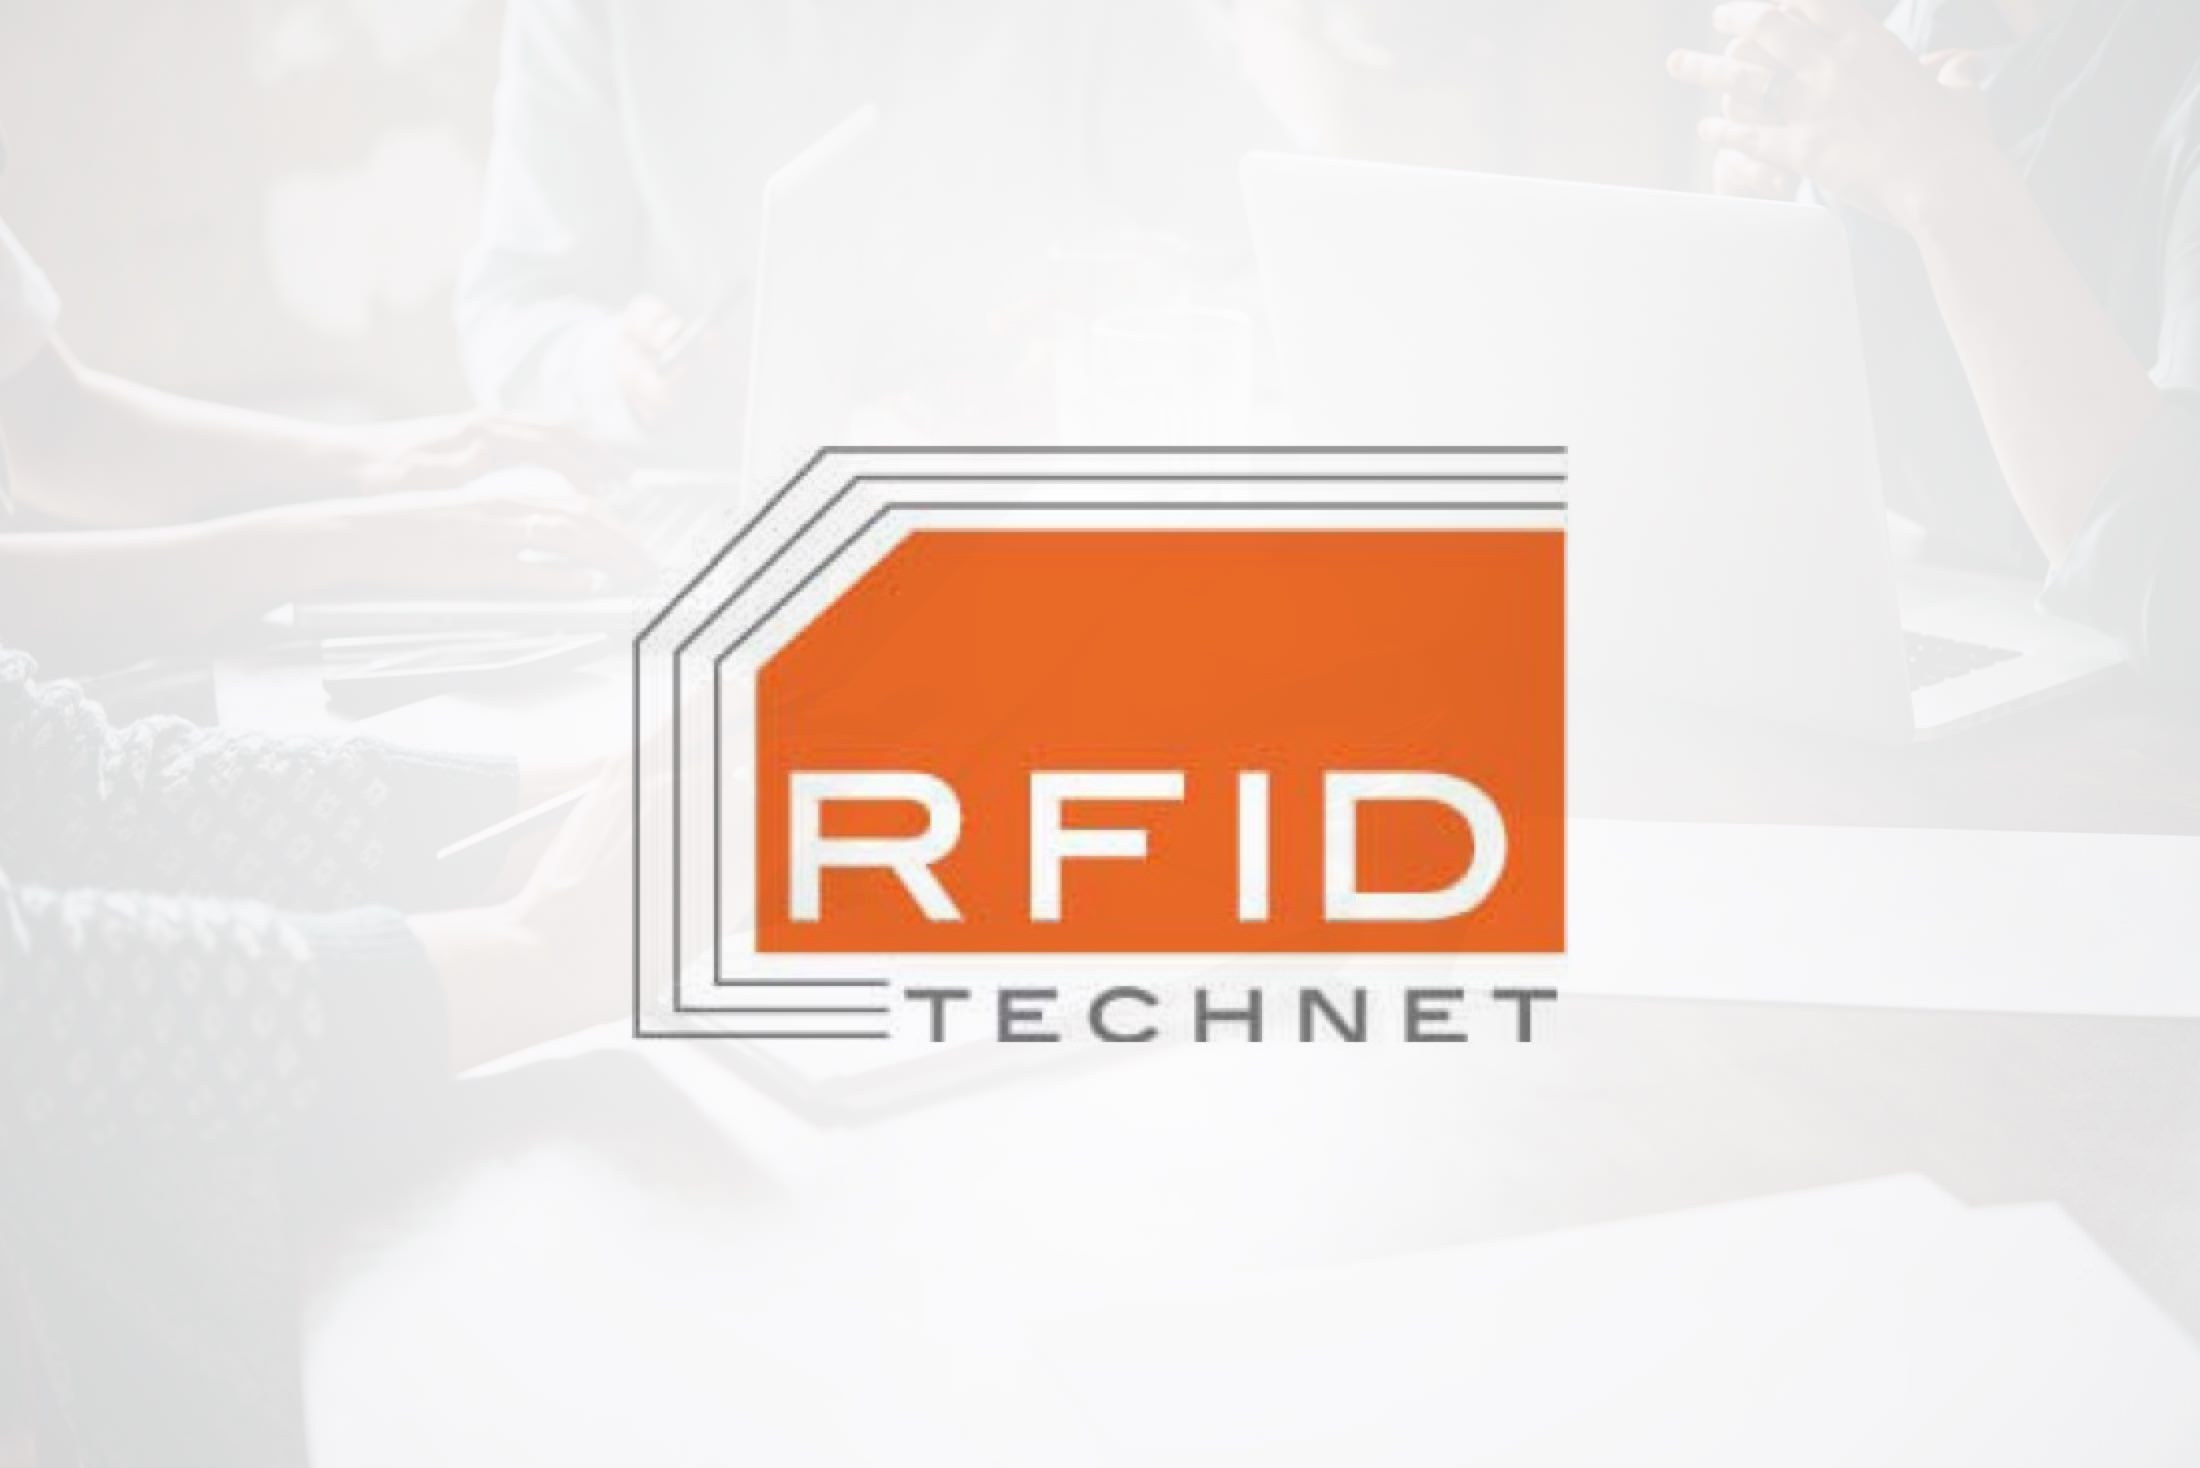 RFID-TechNet » IT Initiative Mecklenburg-Vorpommern e.V.